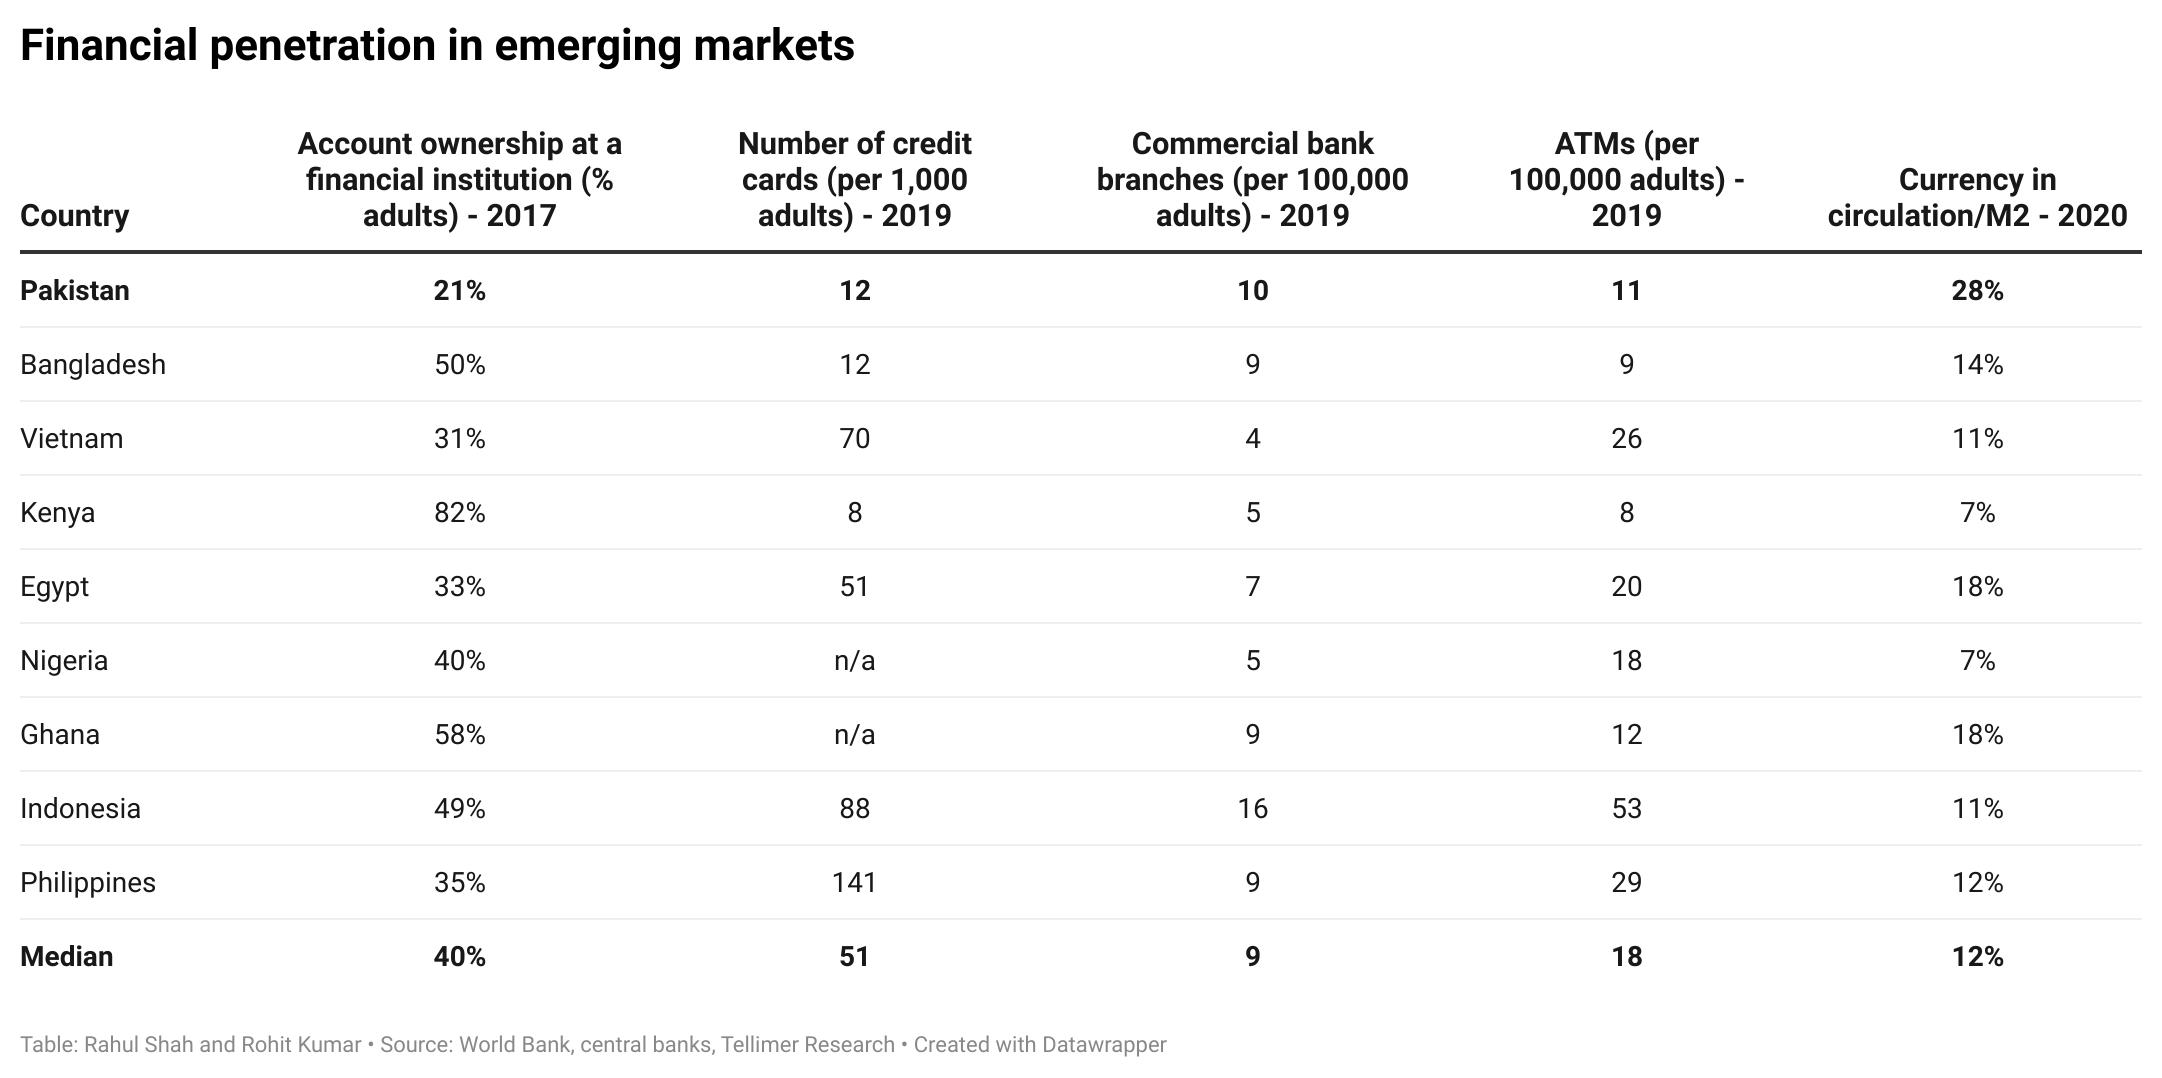 Financial penetration in emerging markets